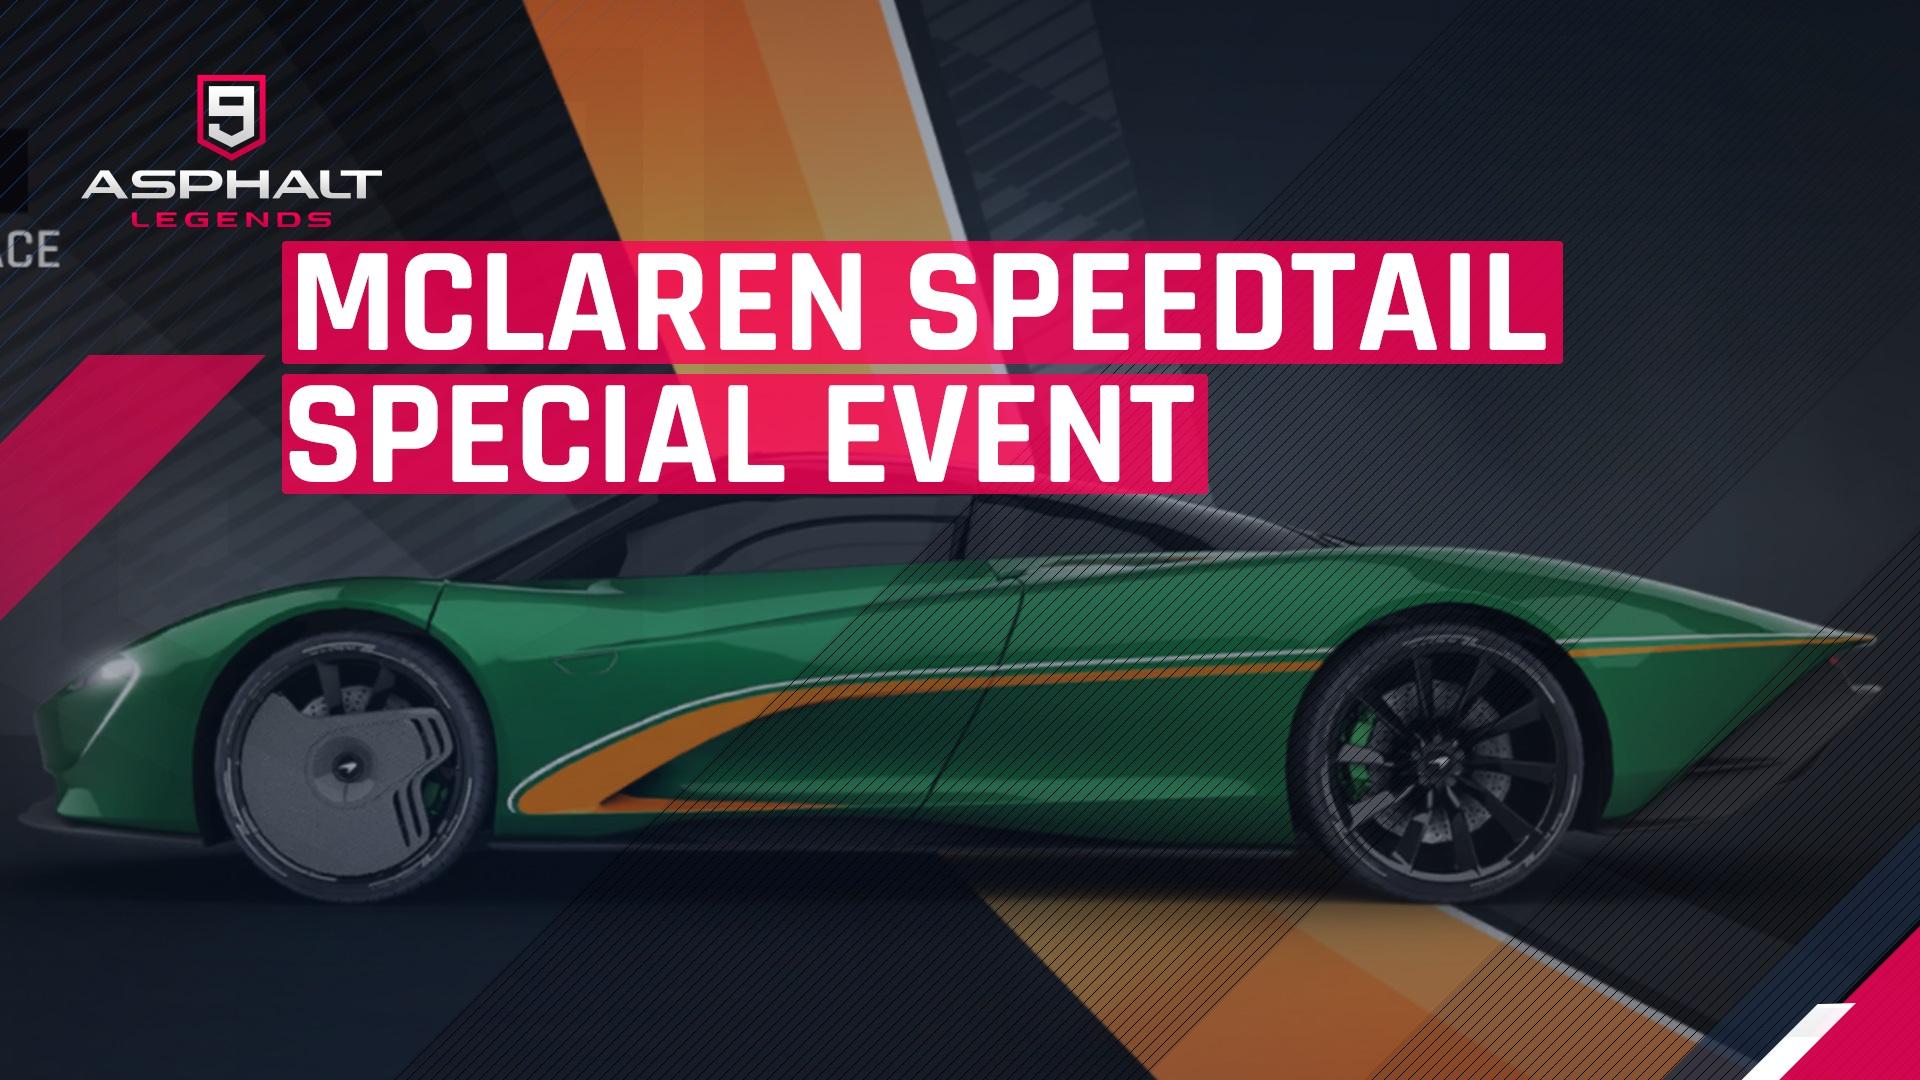 Asphalte 9 McLaren Événement spécial Speedtail